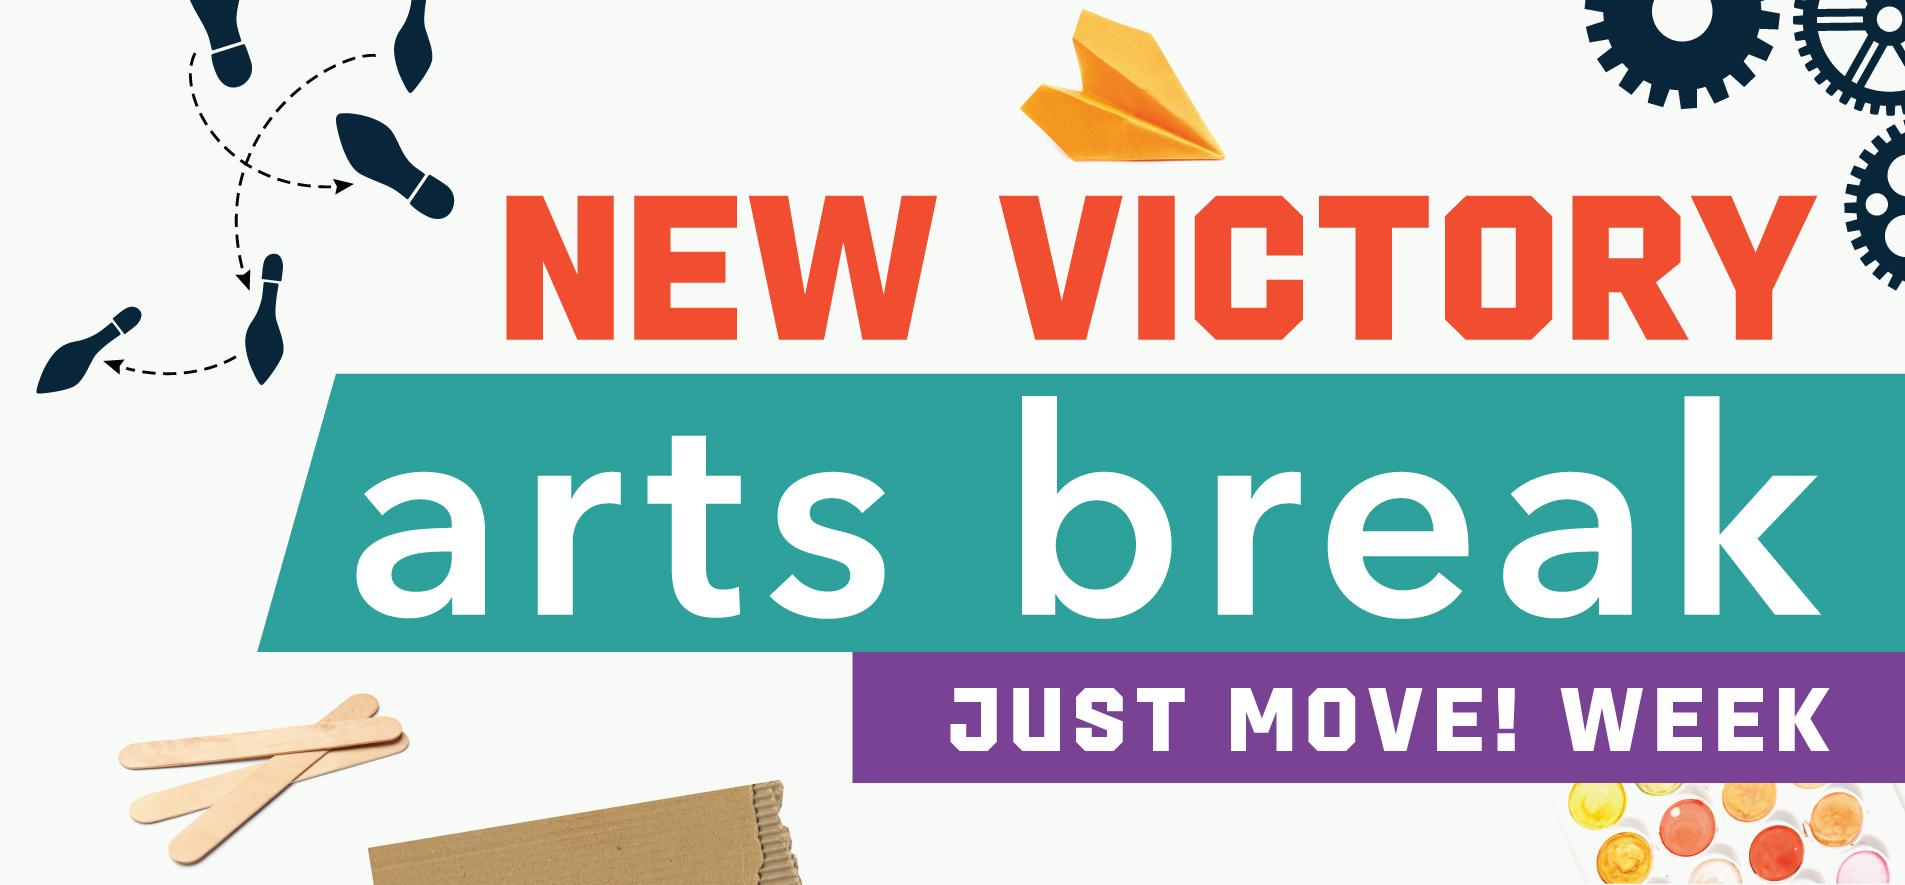 New Victory Arts Break – Just Move! Week